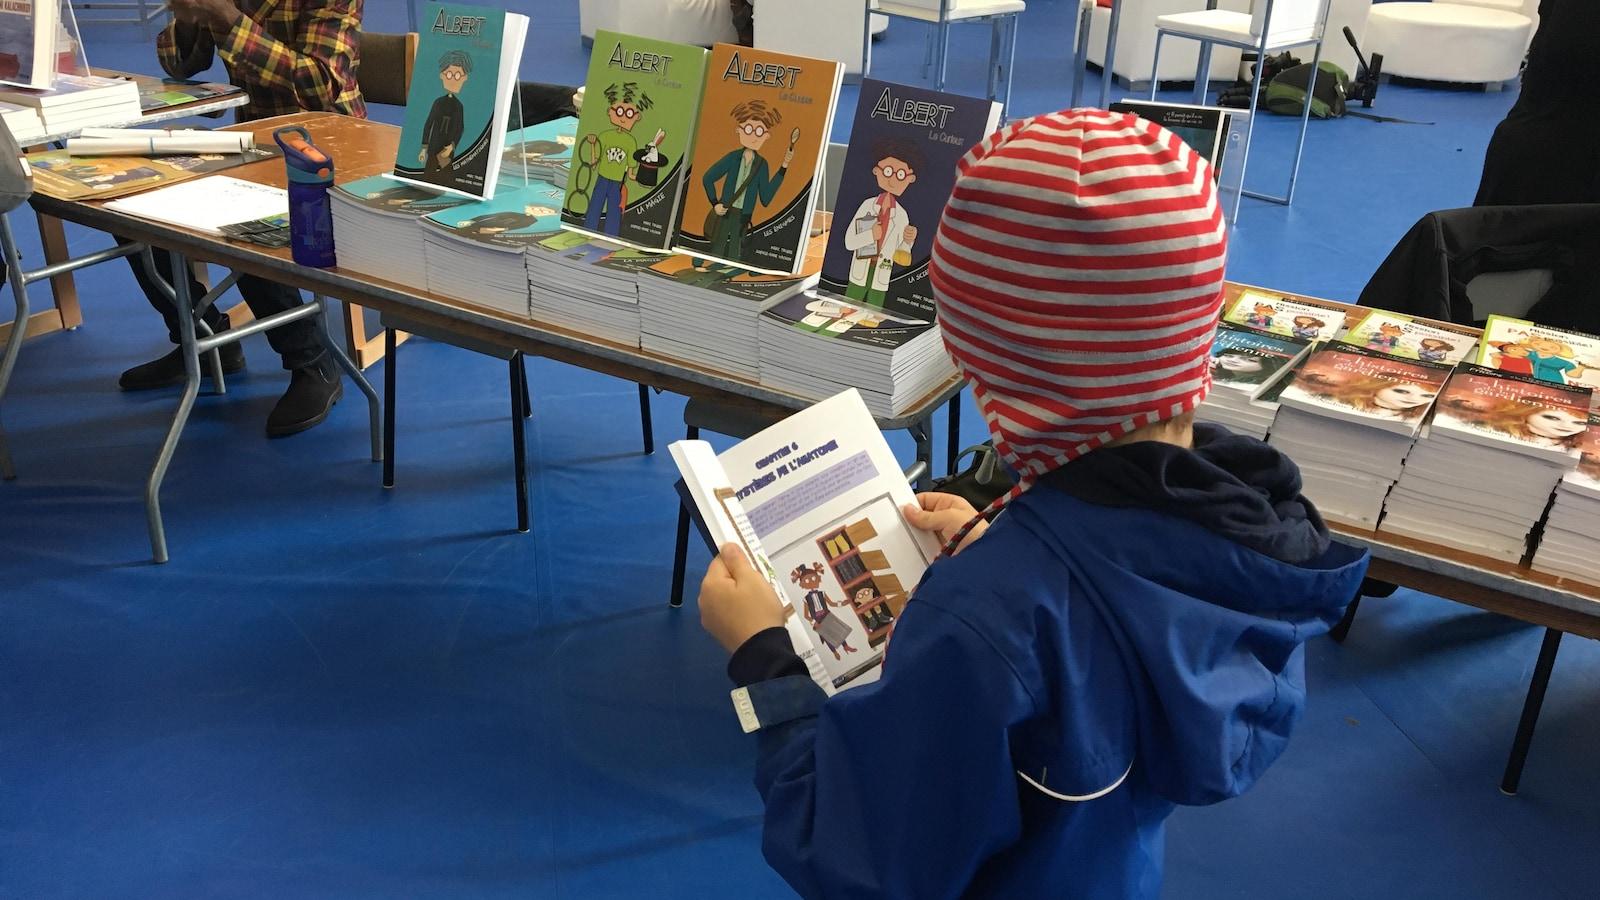 Un jeune garçon lit un livre.